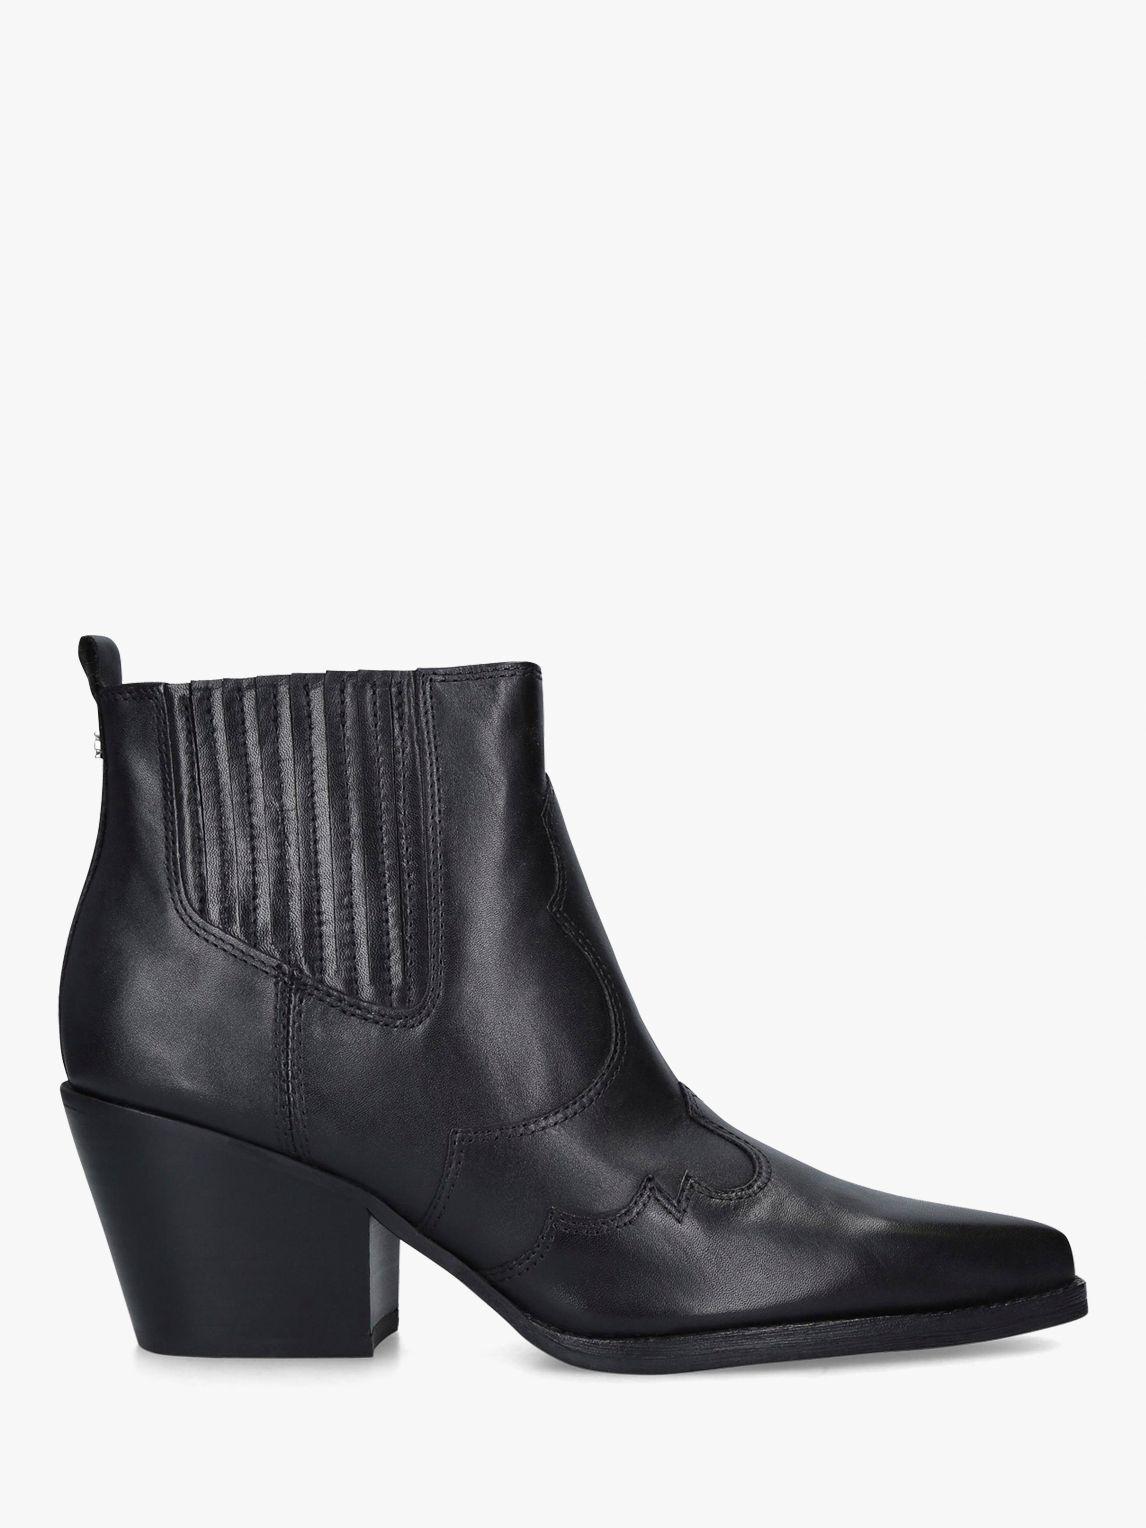 Sam Edelman Sam Edelman Winona Block Heel Leather Cowboy Boots, Black